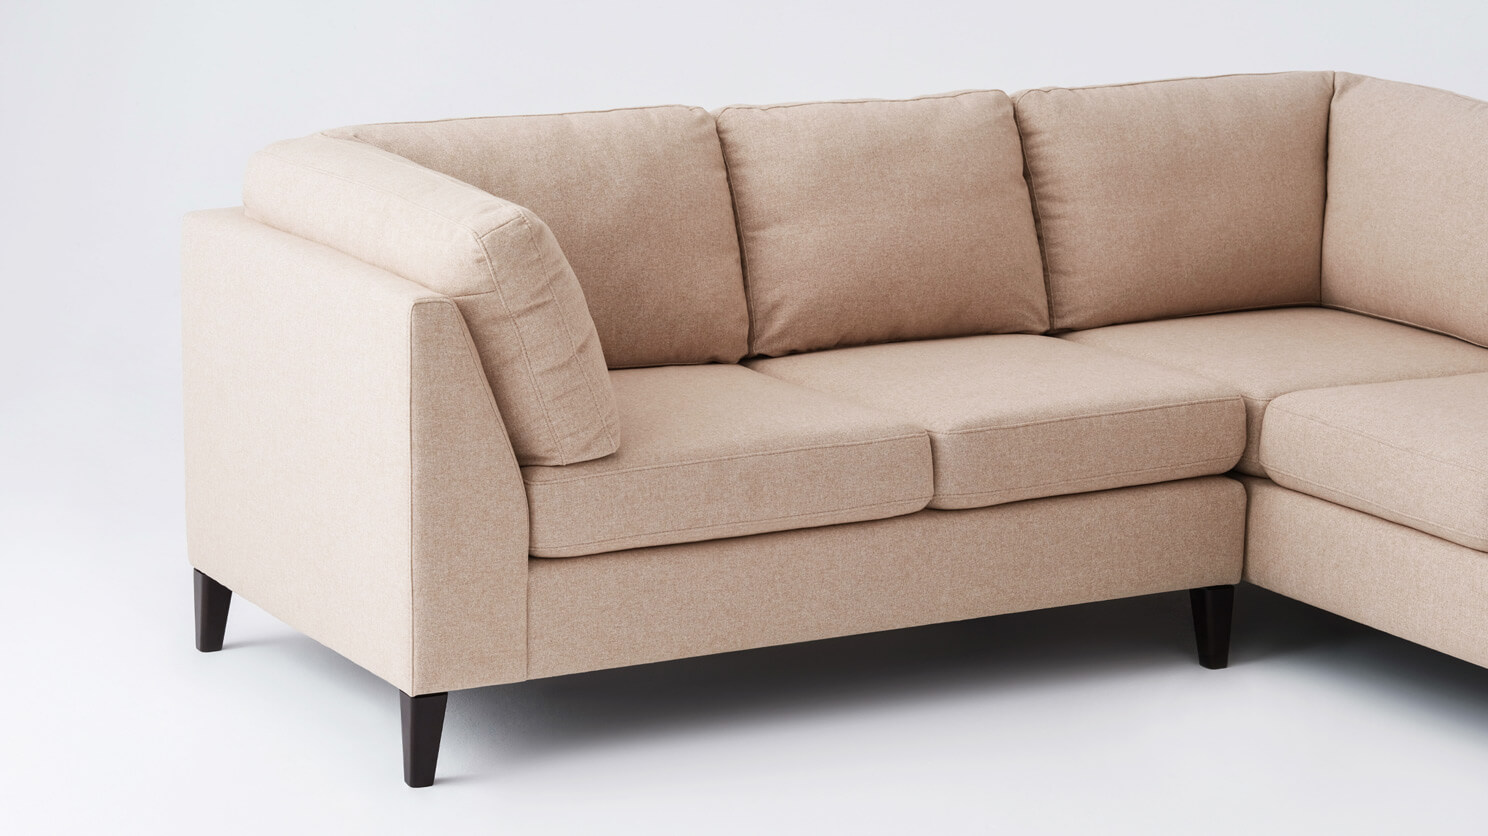 Super Salema 2 Piece Sectional Sofa Ava Camel Ibusinesslaw Wood Chair Design Ideas Ibusinesslaworg